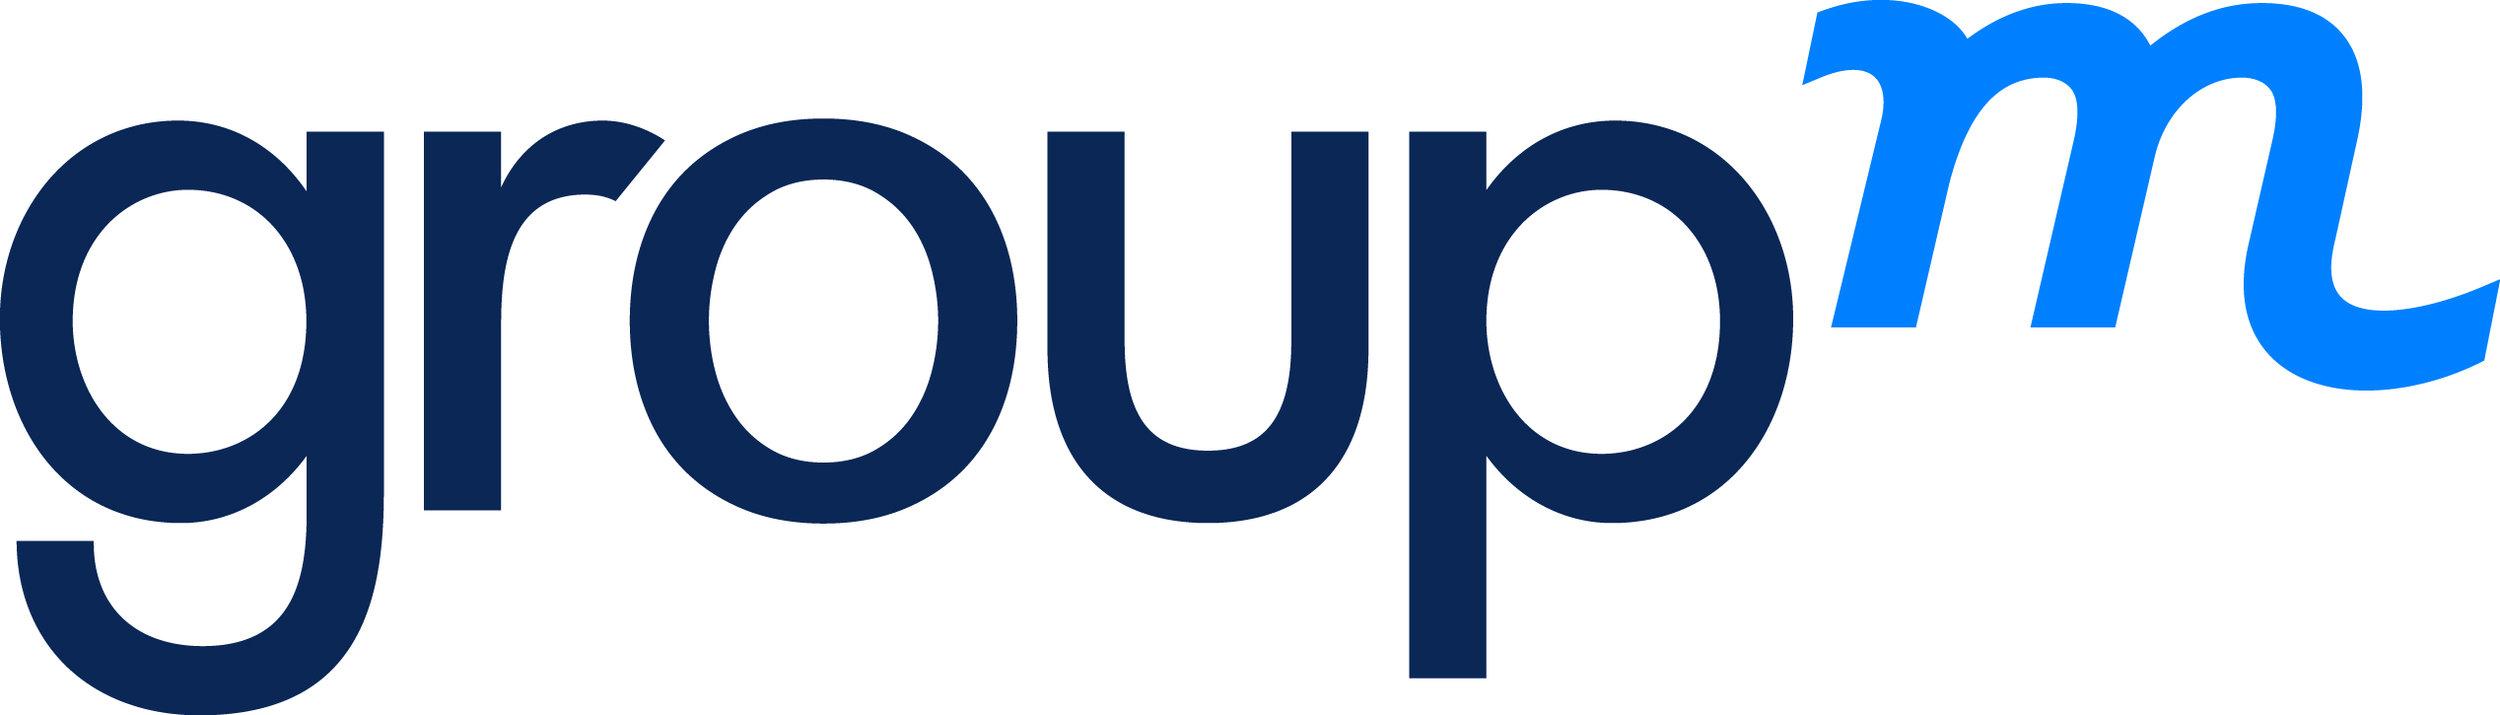 GroupM_Hero_Logo_RGB.jpg